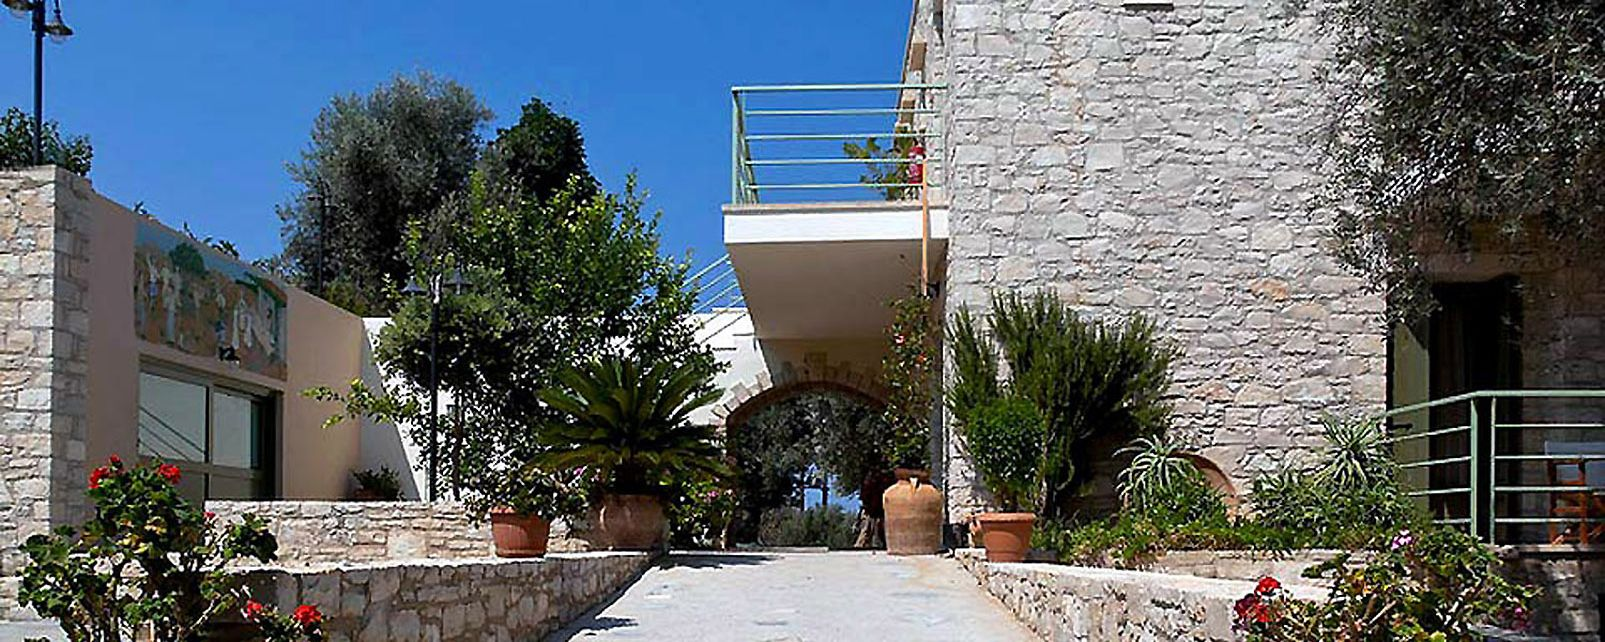 Hotel Dalabelos Ecotourism Estate